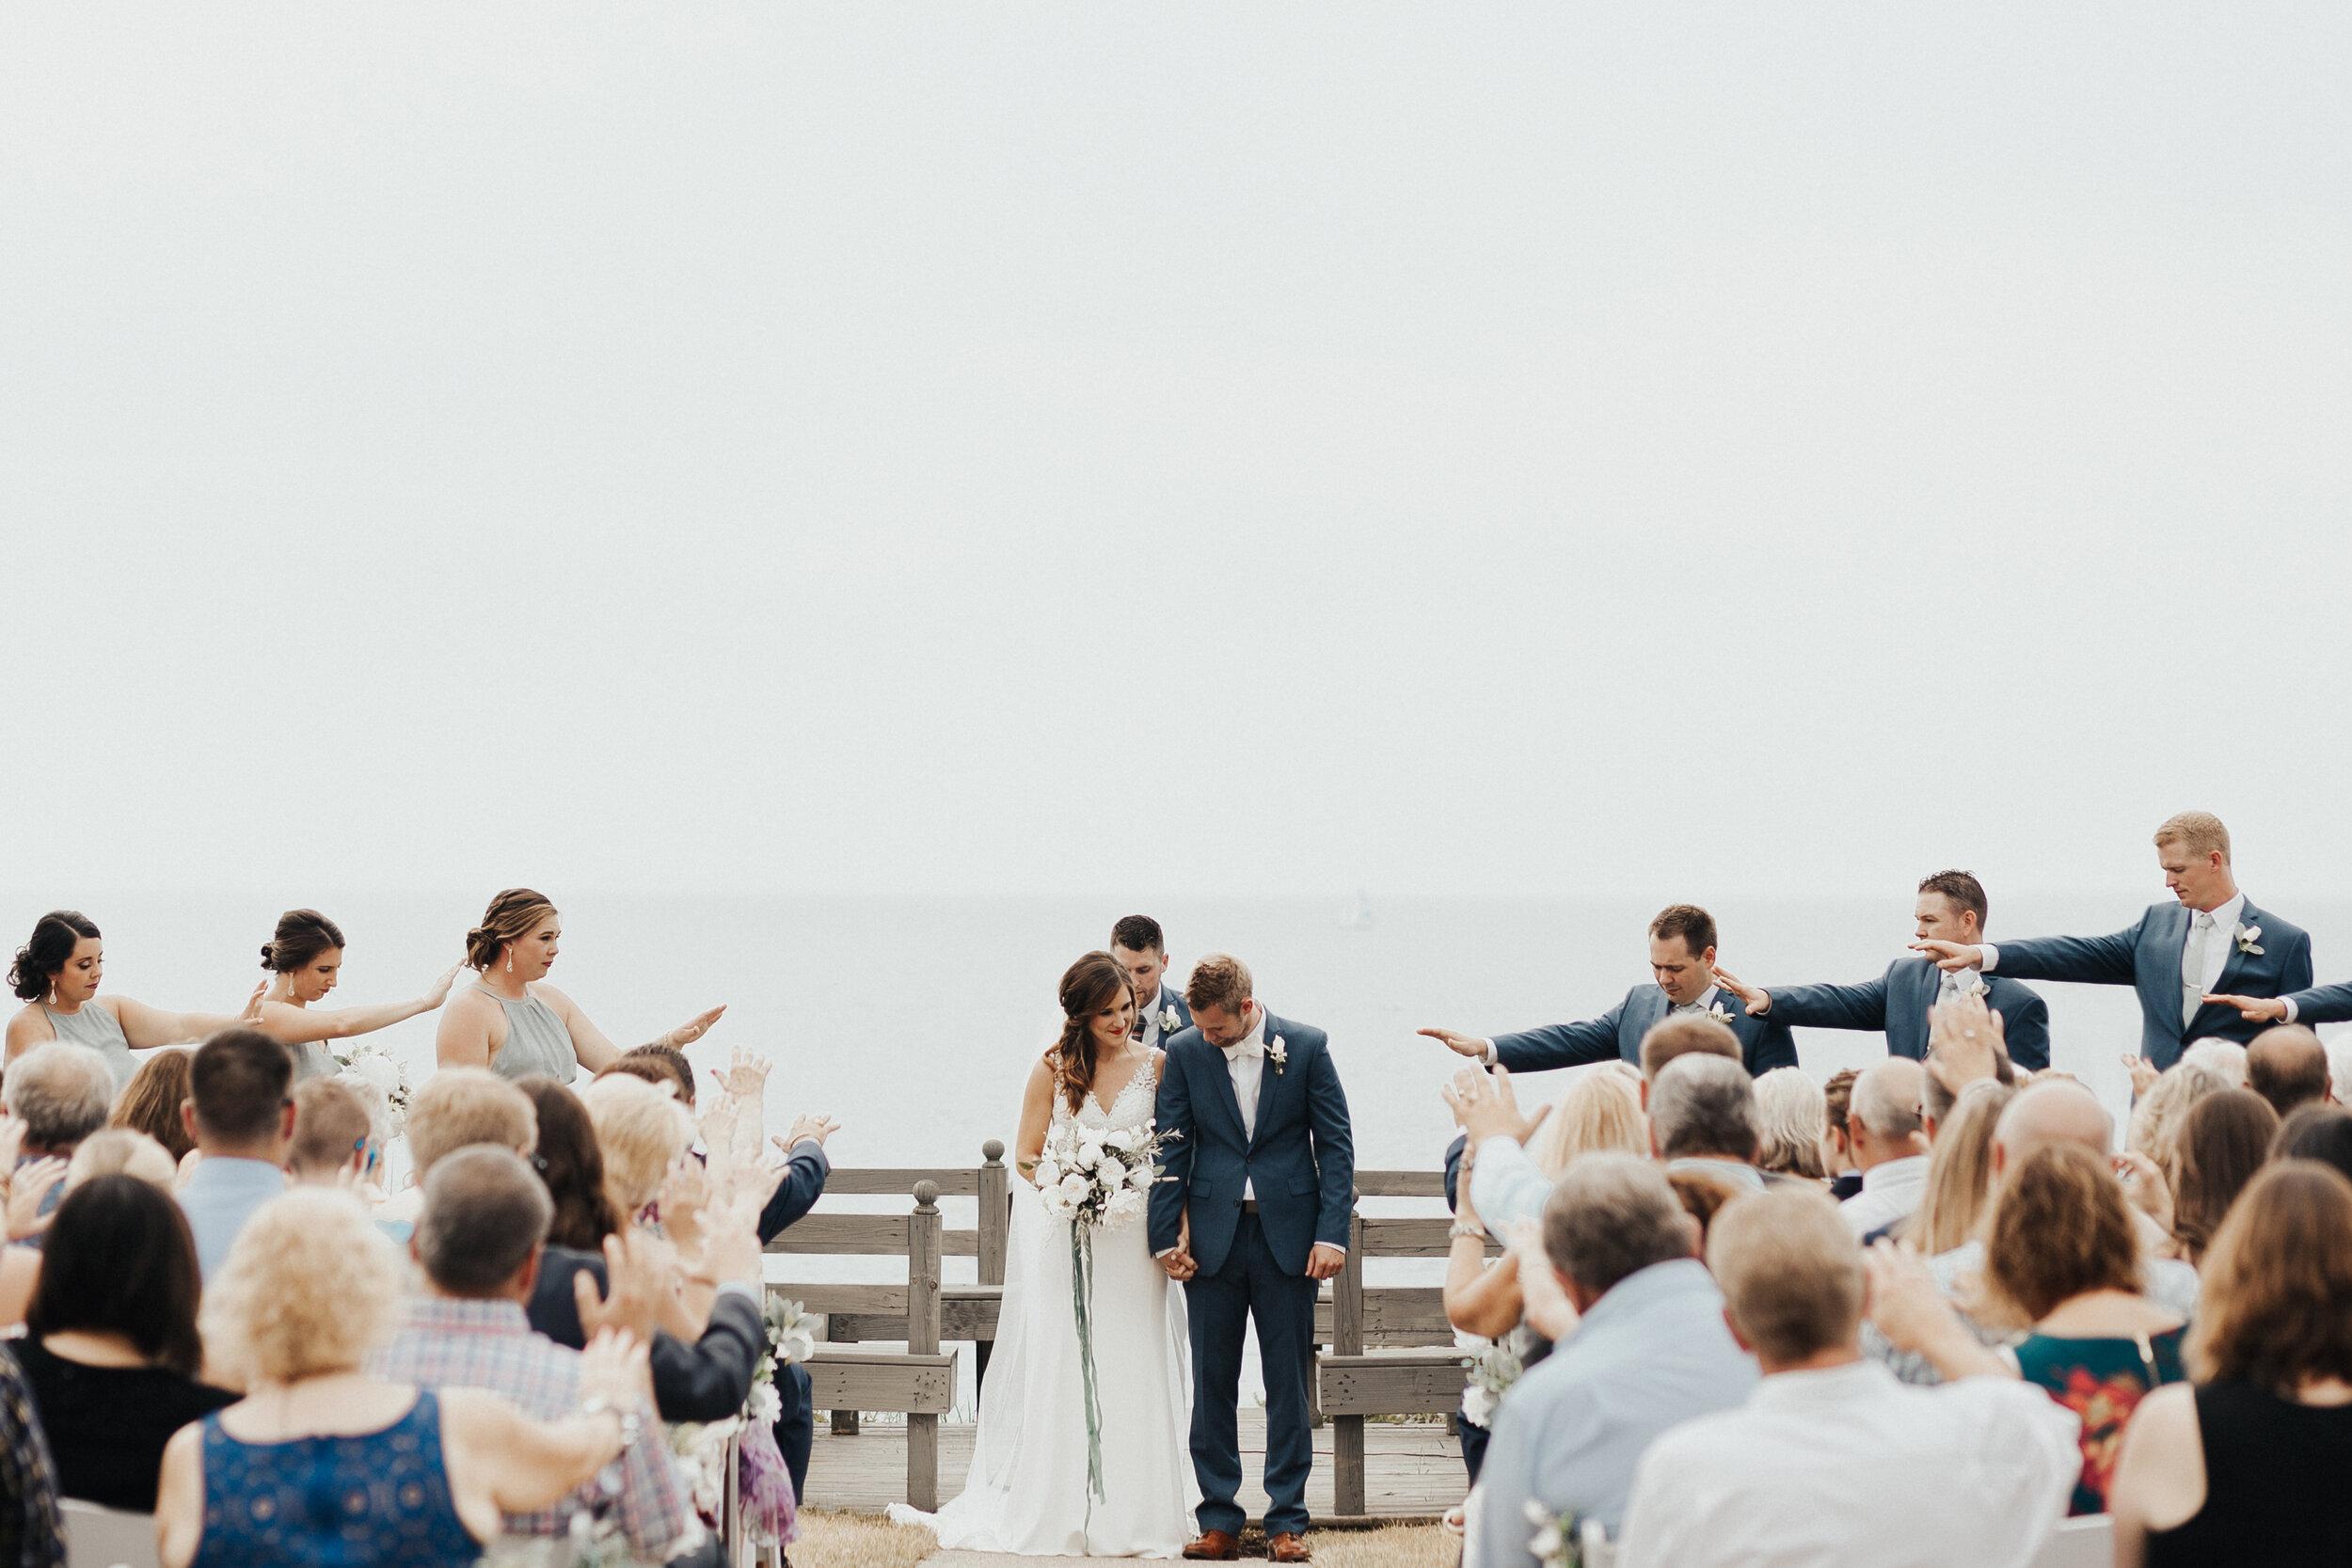 LAKE MICHIGAN BACKYARD WEDDING